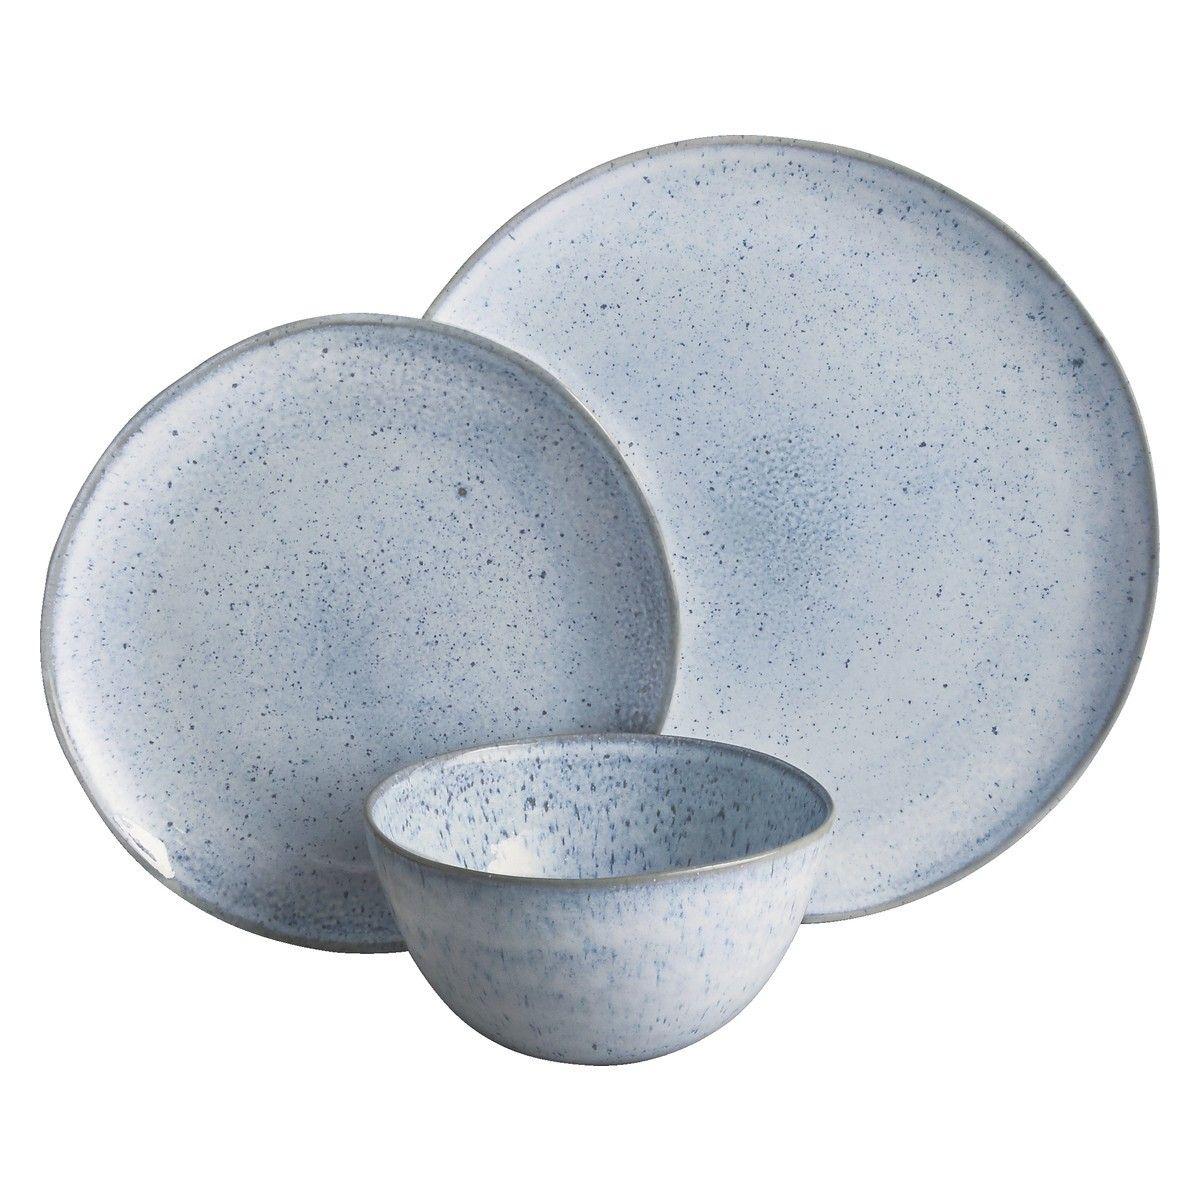 OLMO Light blue 12 piece dinner set   Buy now at Habitat UK ...